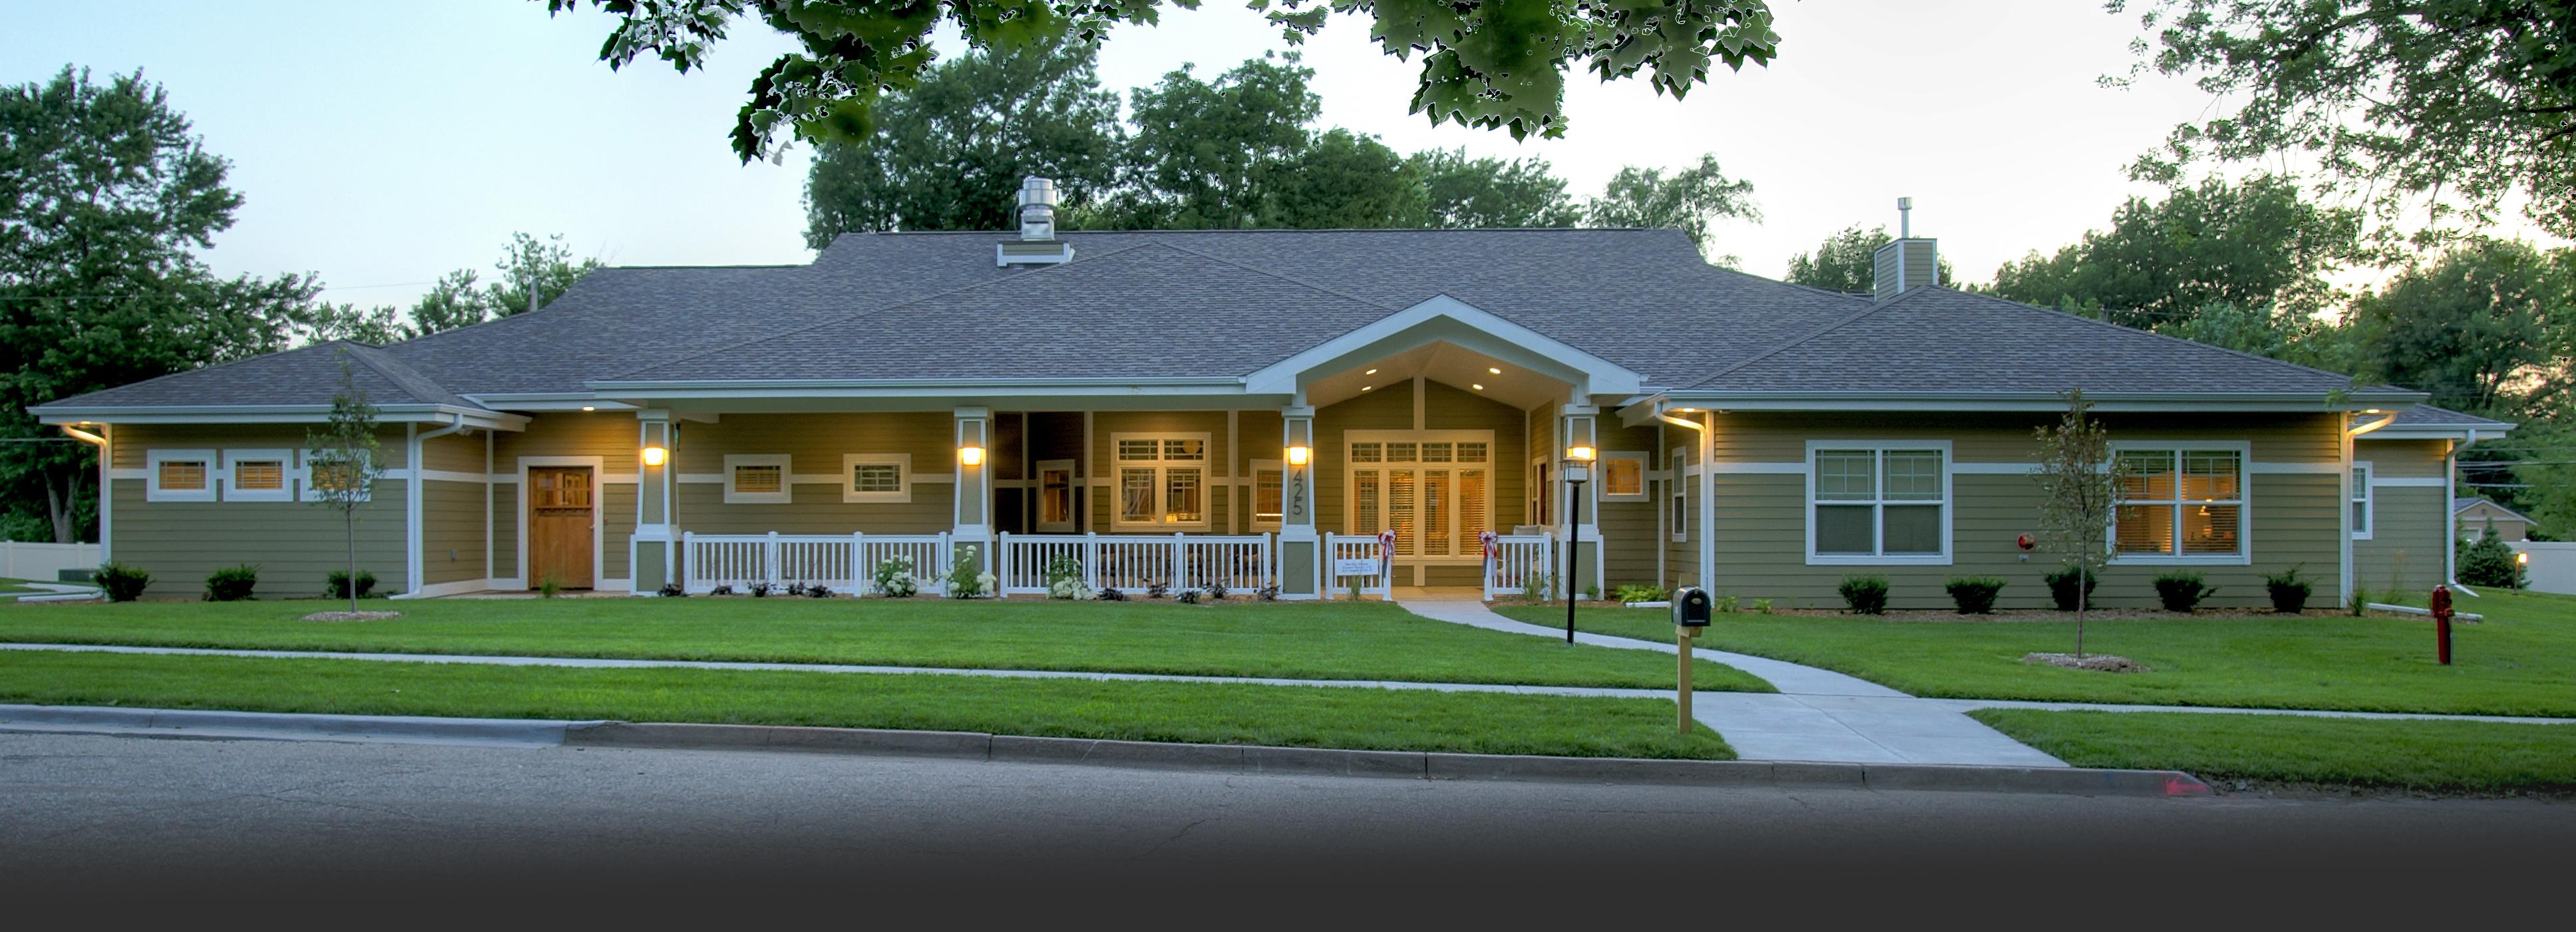 Tabitha Green House